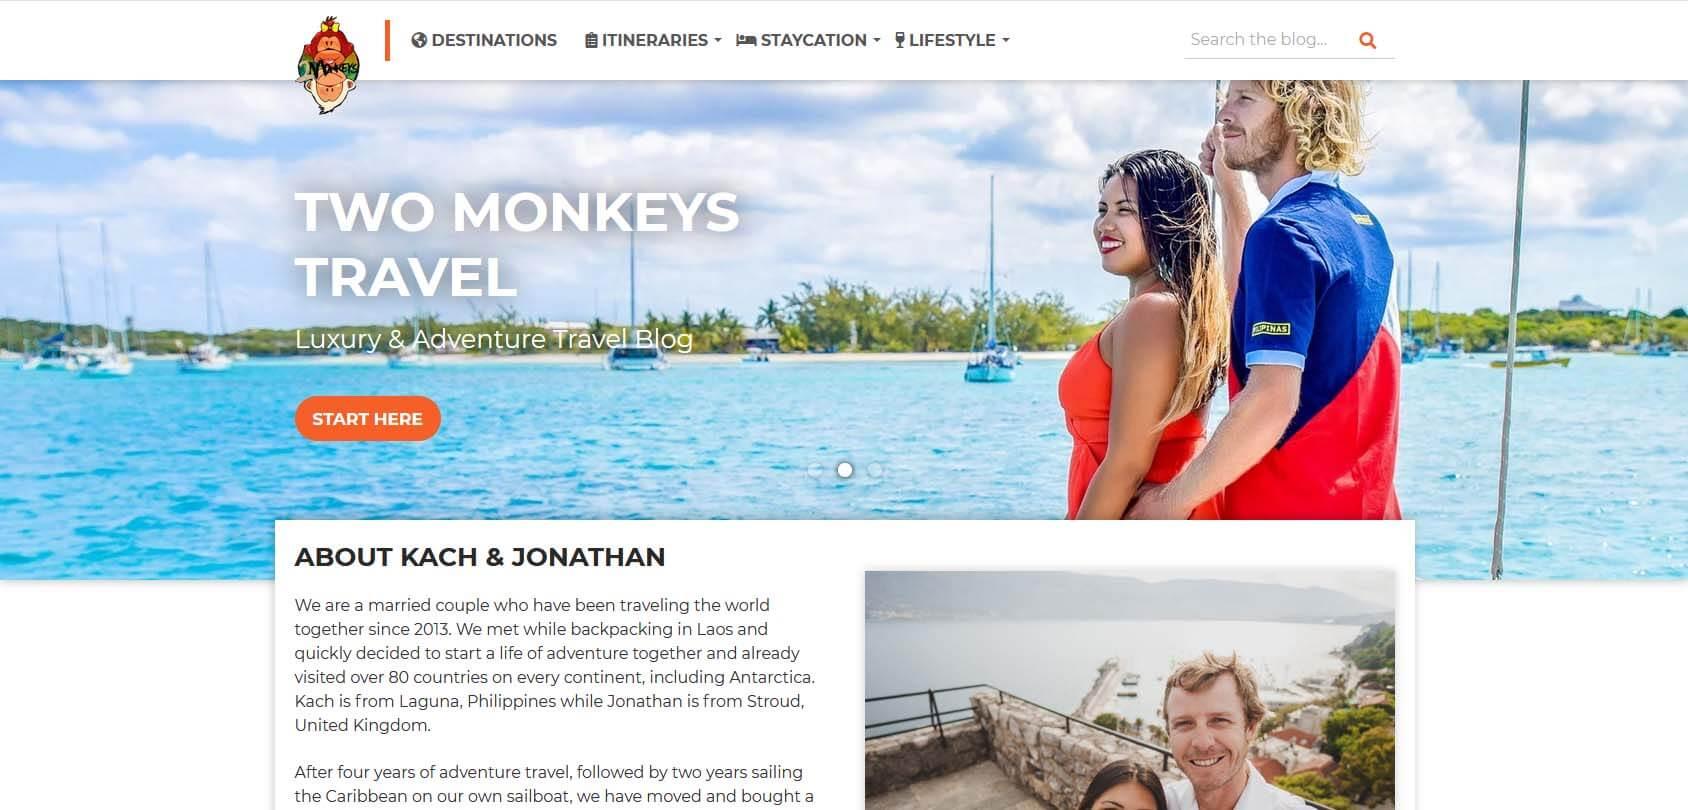 Two Monkeys Travel Homepage